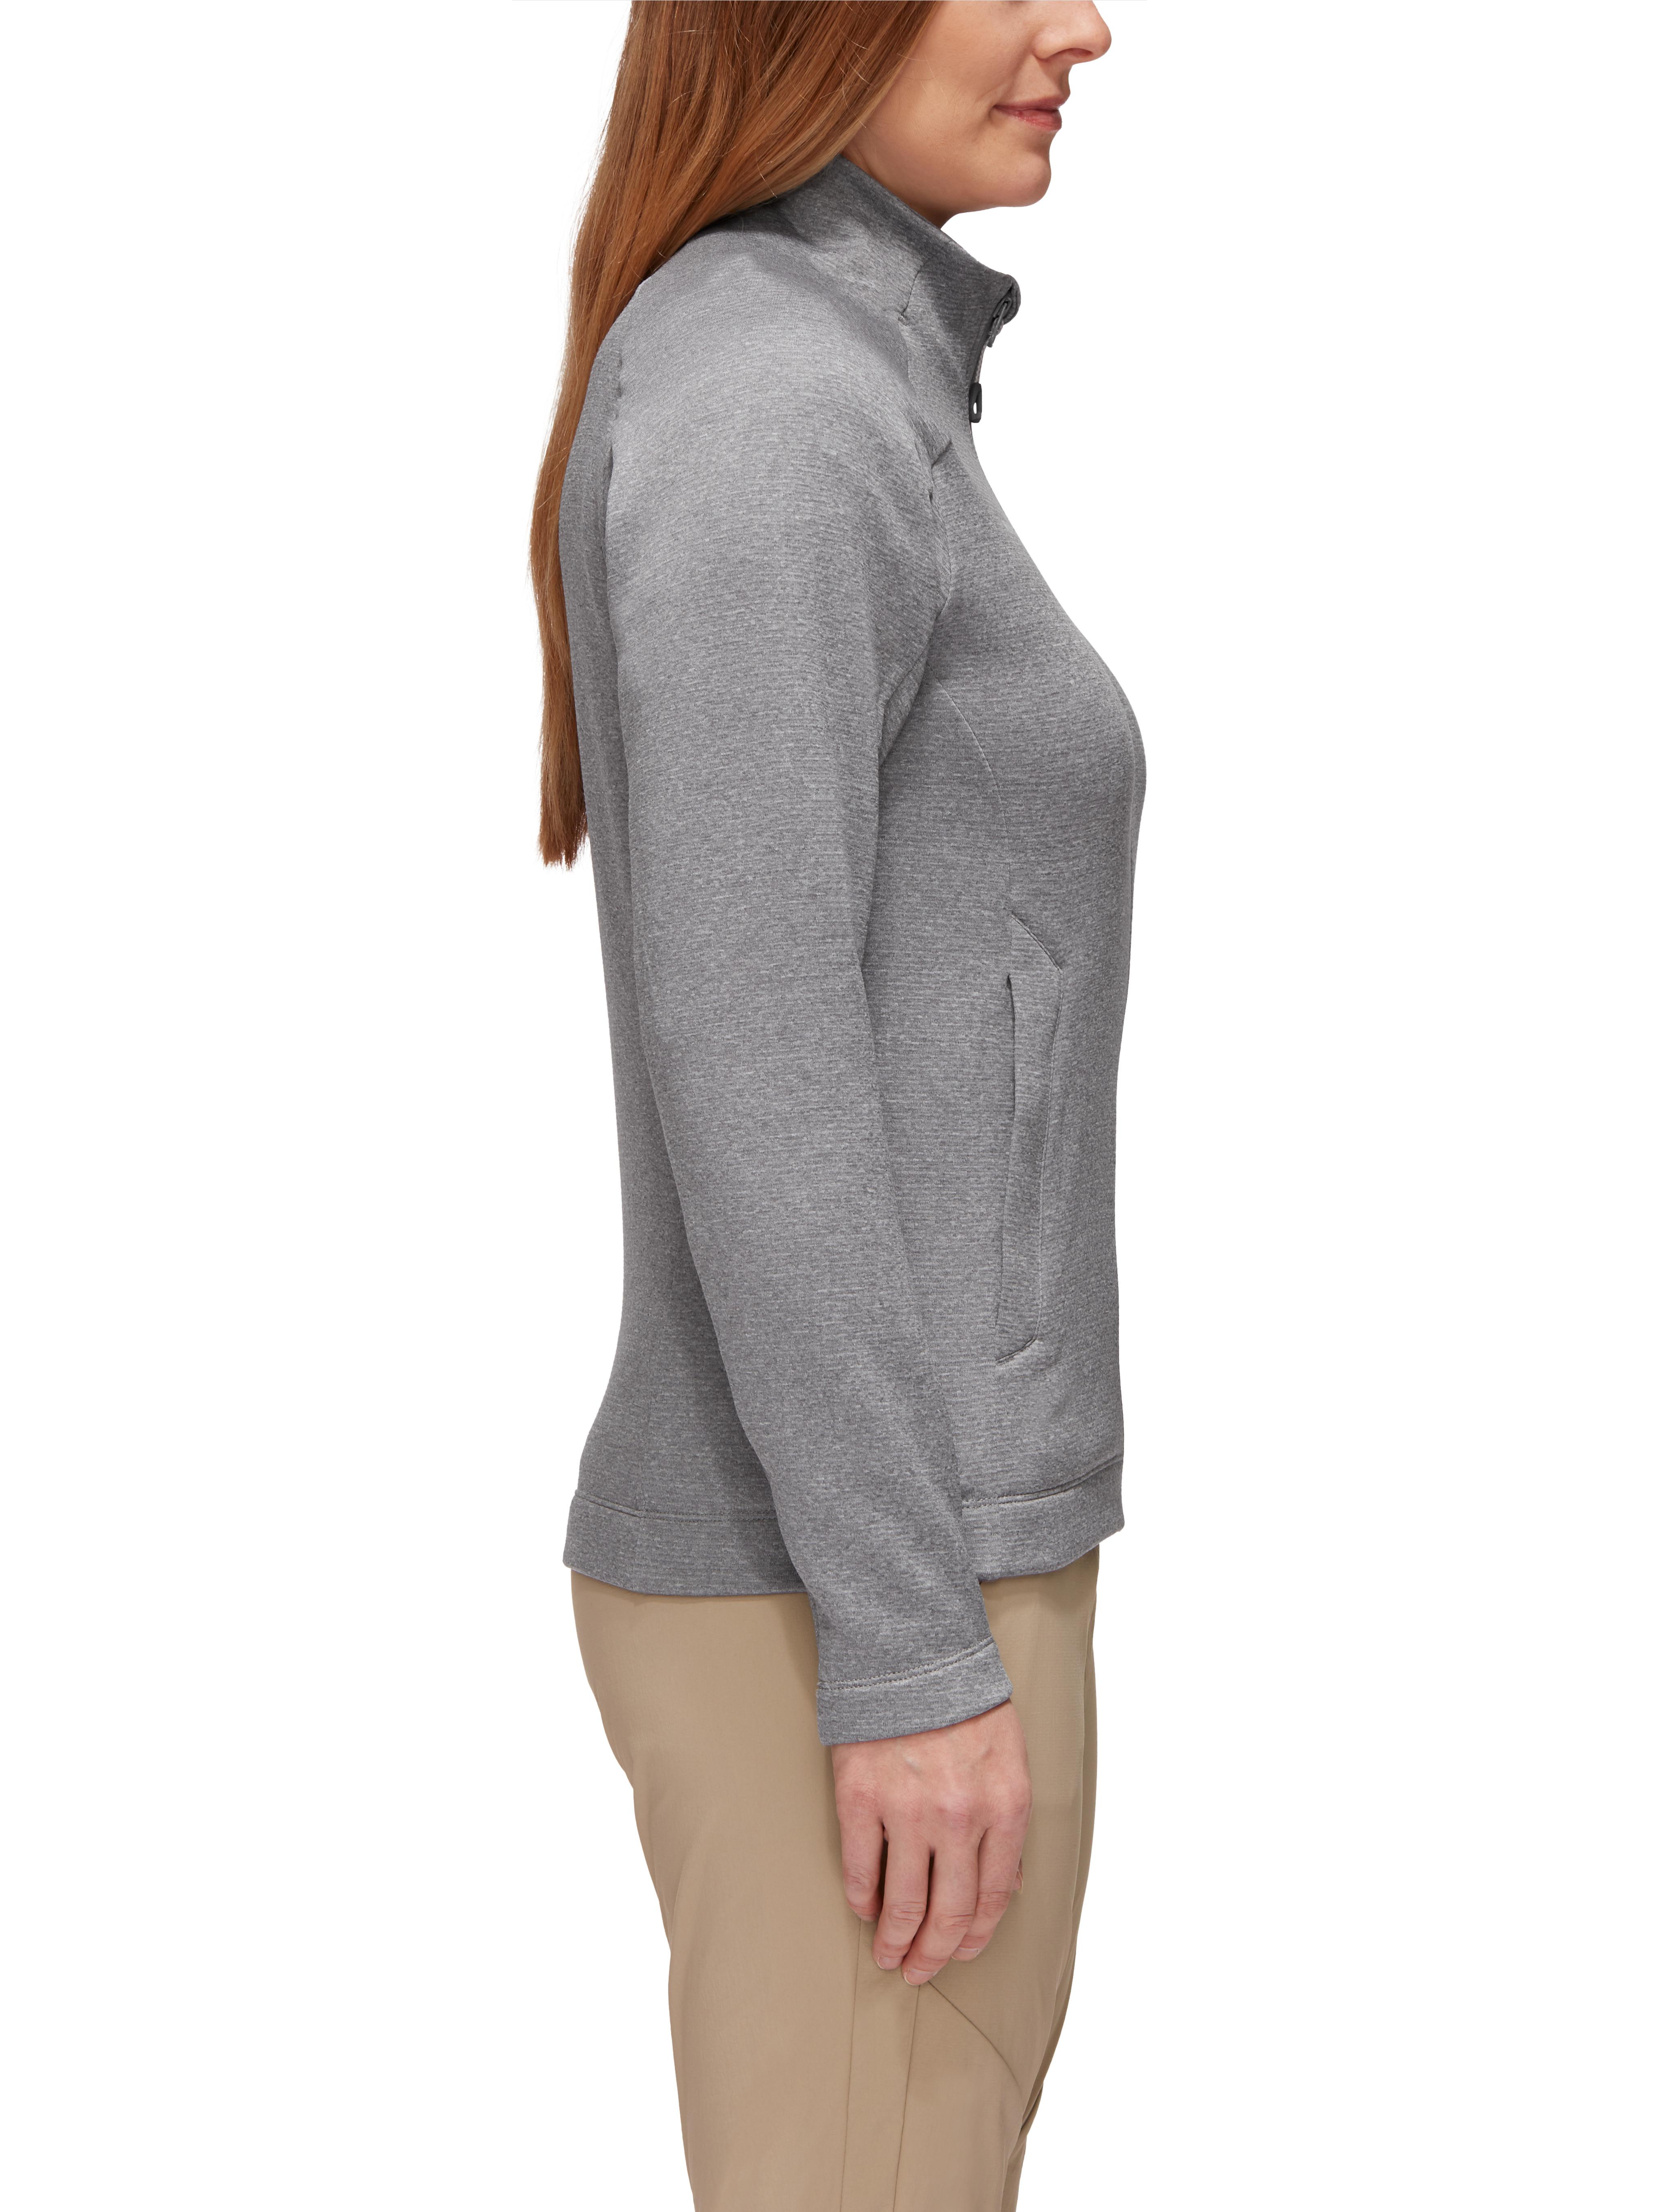 Nair ML Jacket Women product image